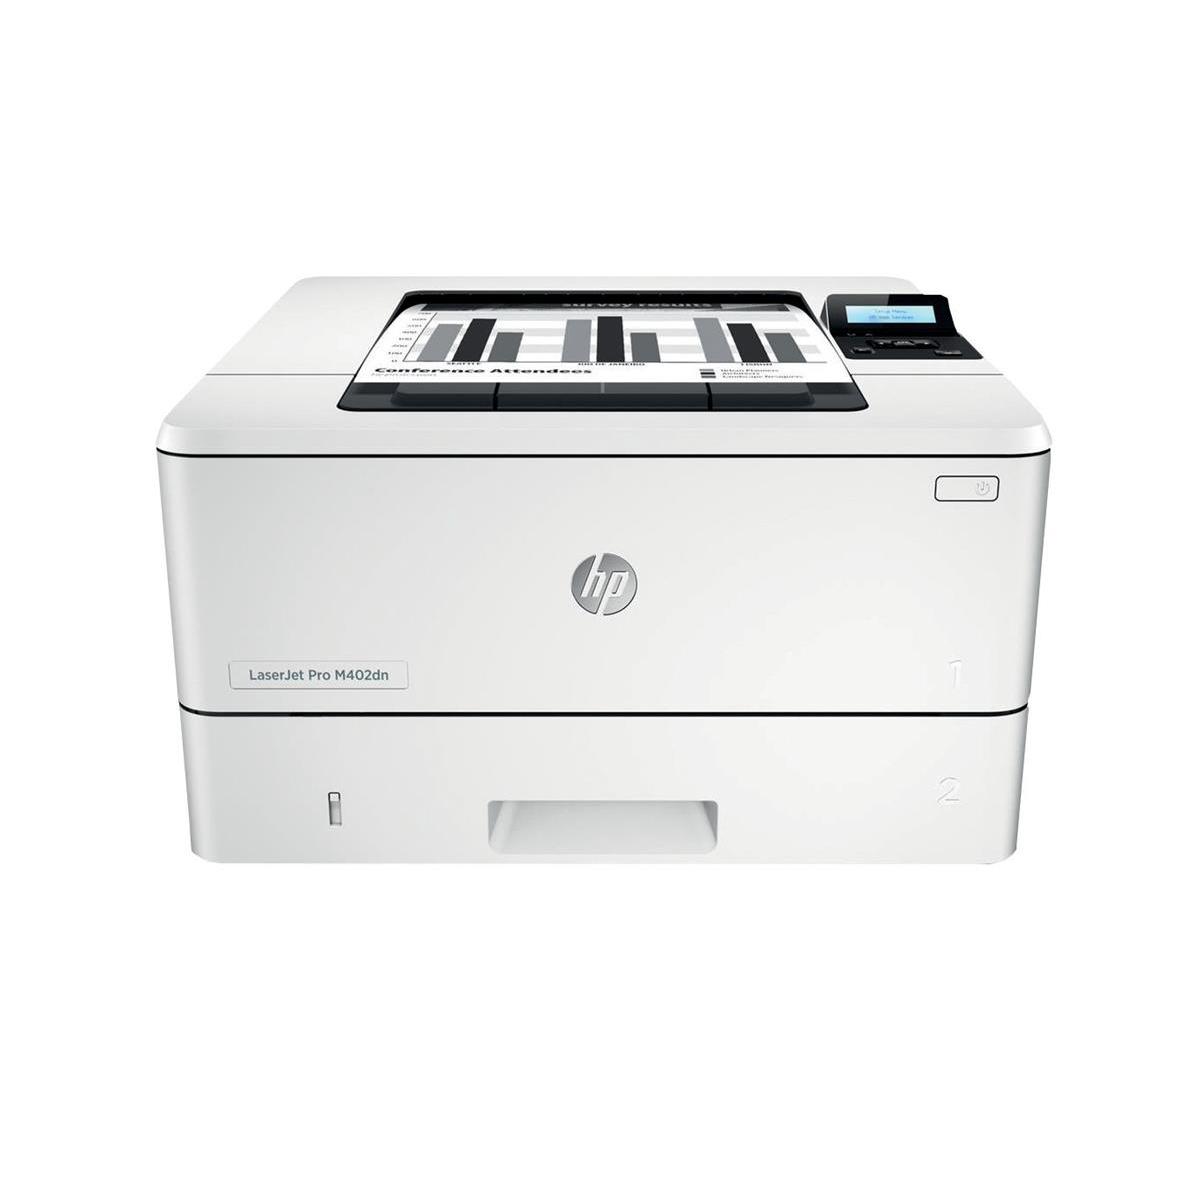 Hewlett Packard HP LaserJet Pro M402dn Mono Laser Printer A4 Ref C5F94A